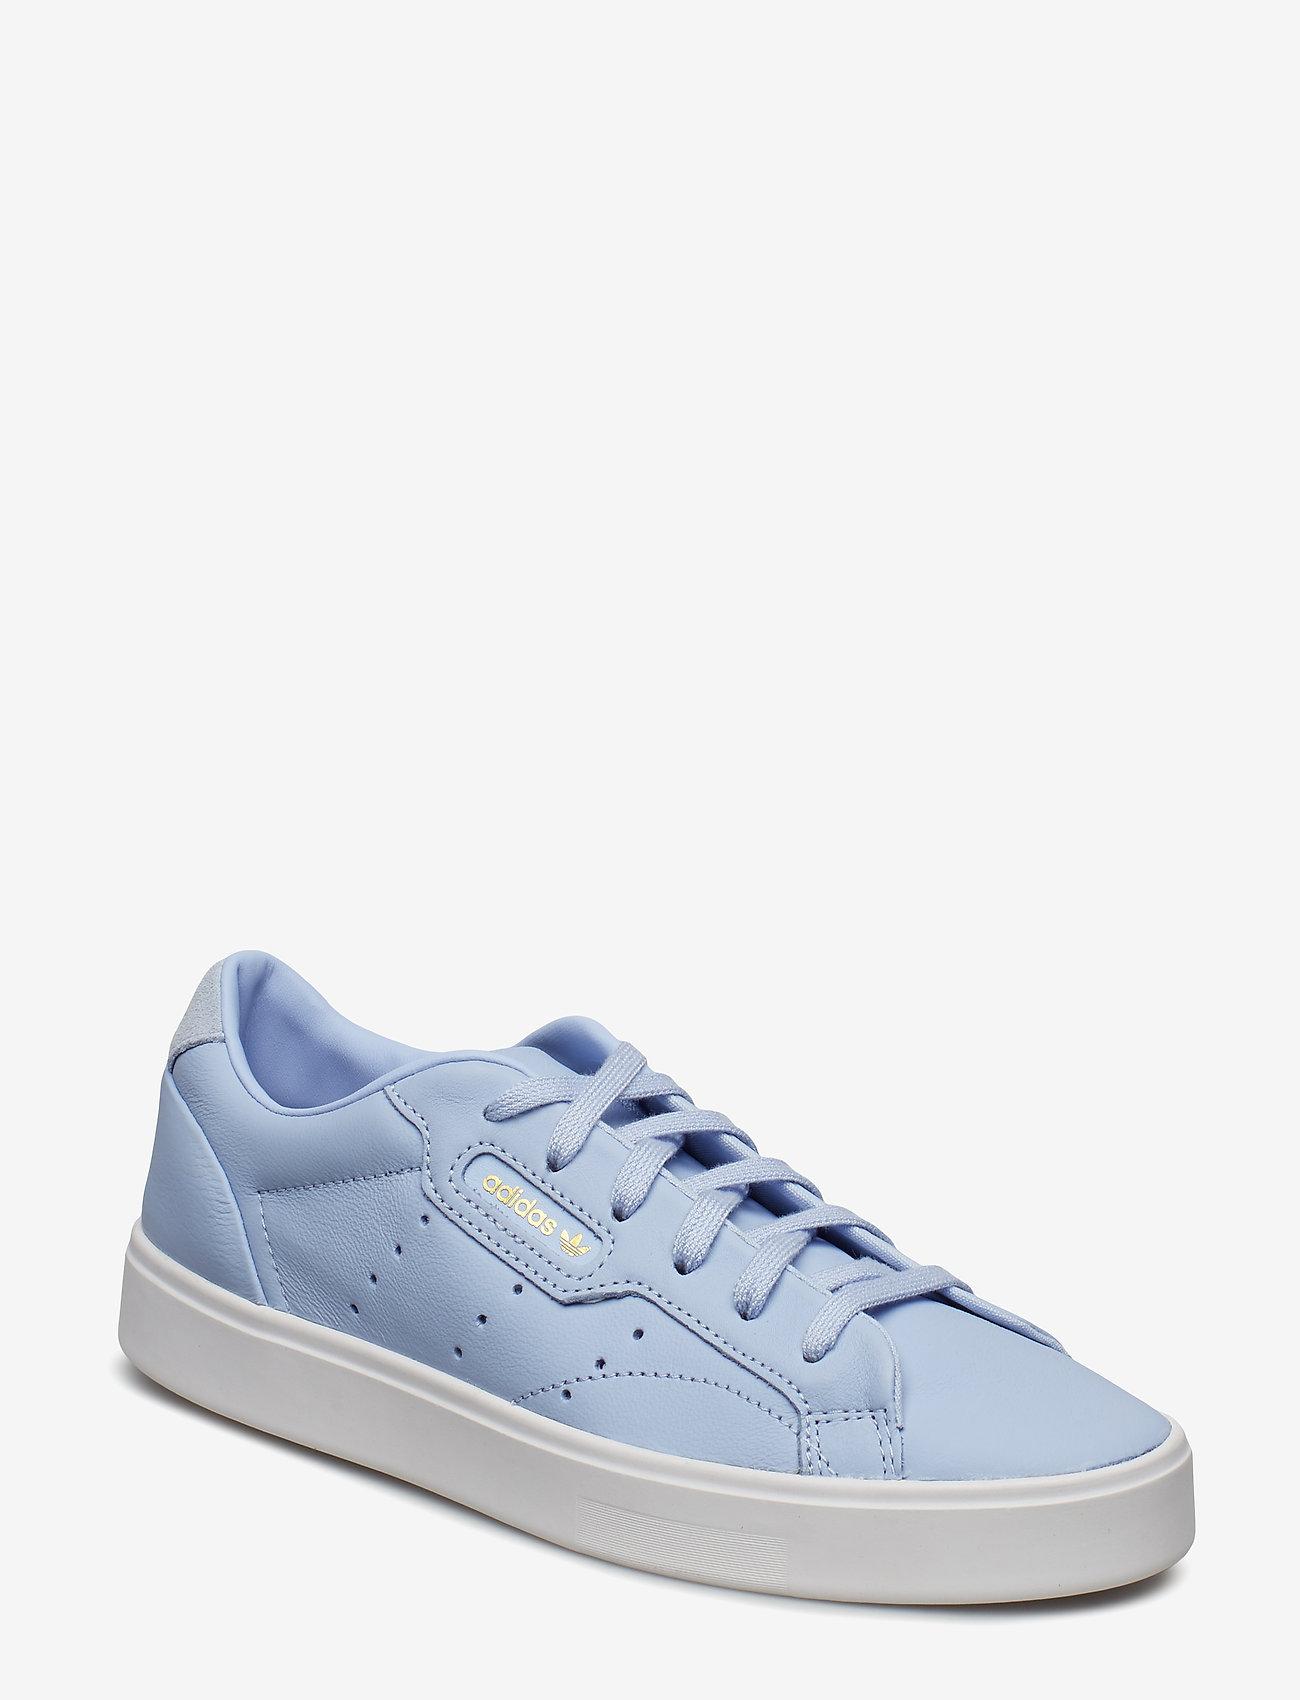 adidas Originals adidas SLEEK W - Sneaker PERIWI/PERIWI/CRYWHT - Schuhe Billige